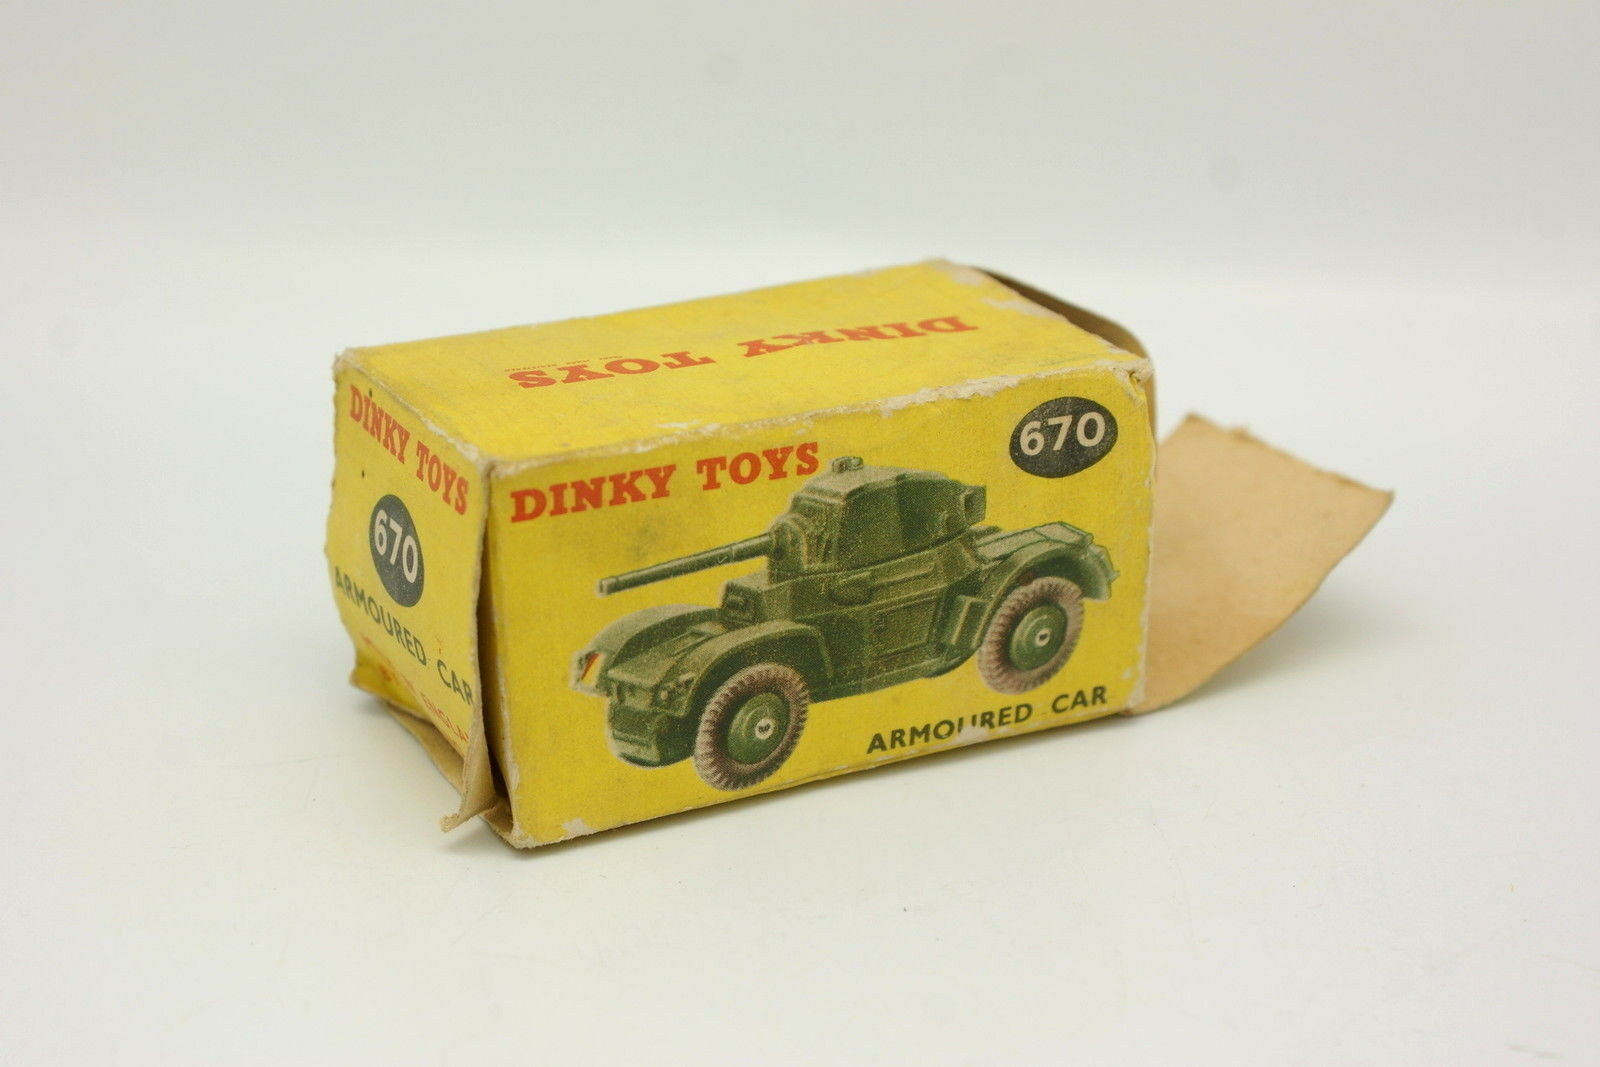 Dinky Toys GB 1 43 - Tanque Blindado blindado blindado blindado Car Militar 670 + Caja 23a3da